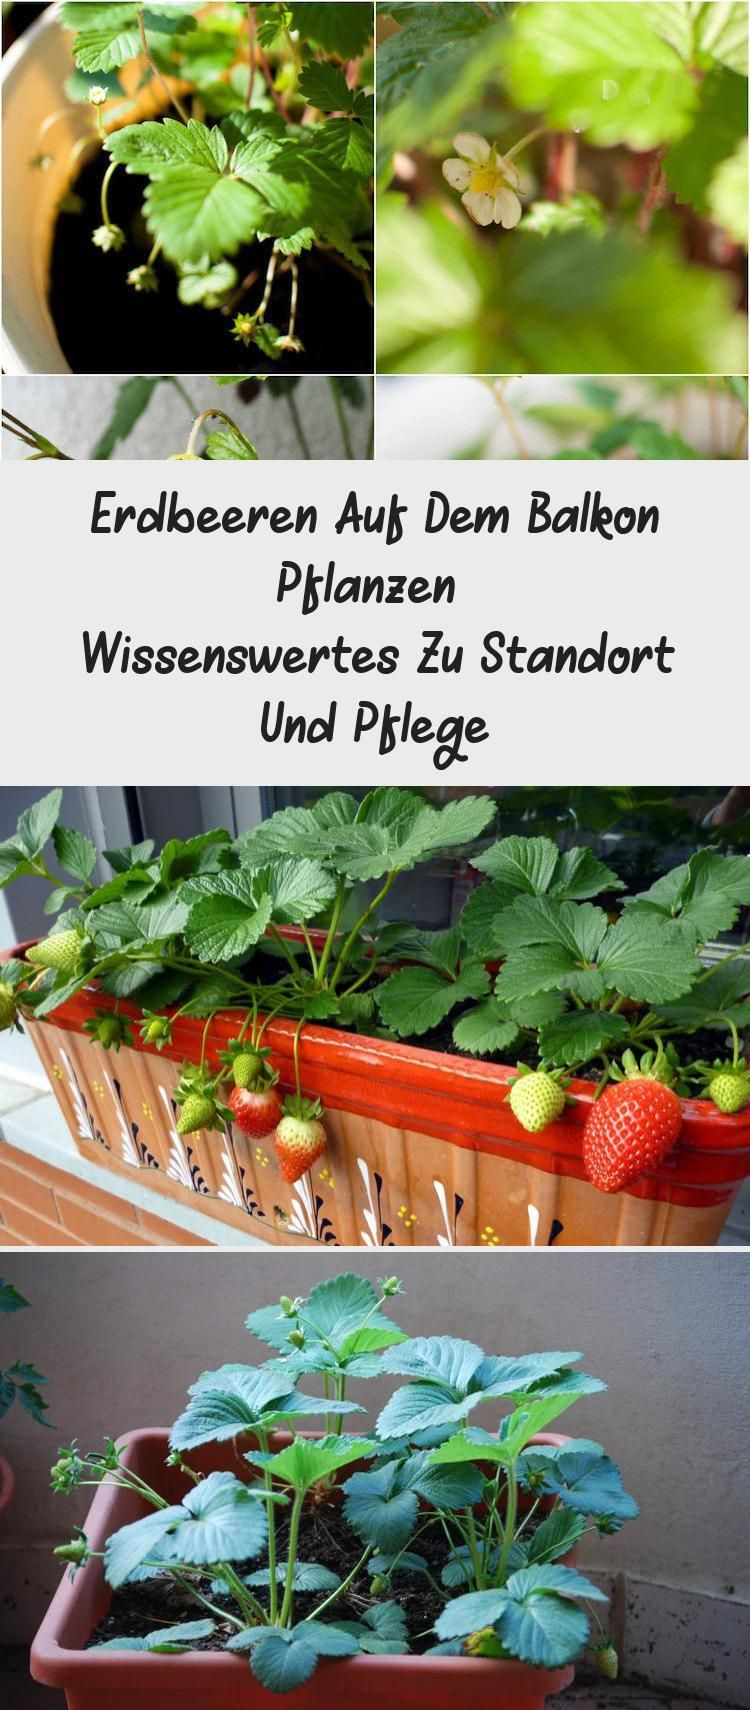 Erdbeeren Auf Dem Balkon Pflanzen Wissenswertes Zu Standort Und Pflege Pflanzen Balkon Pflanzen Erdbeerpflanzen